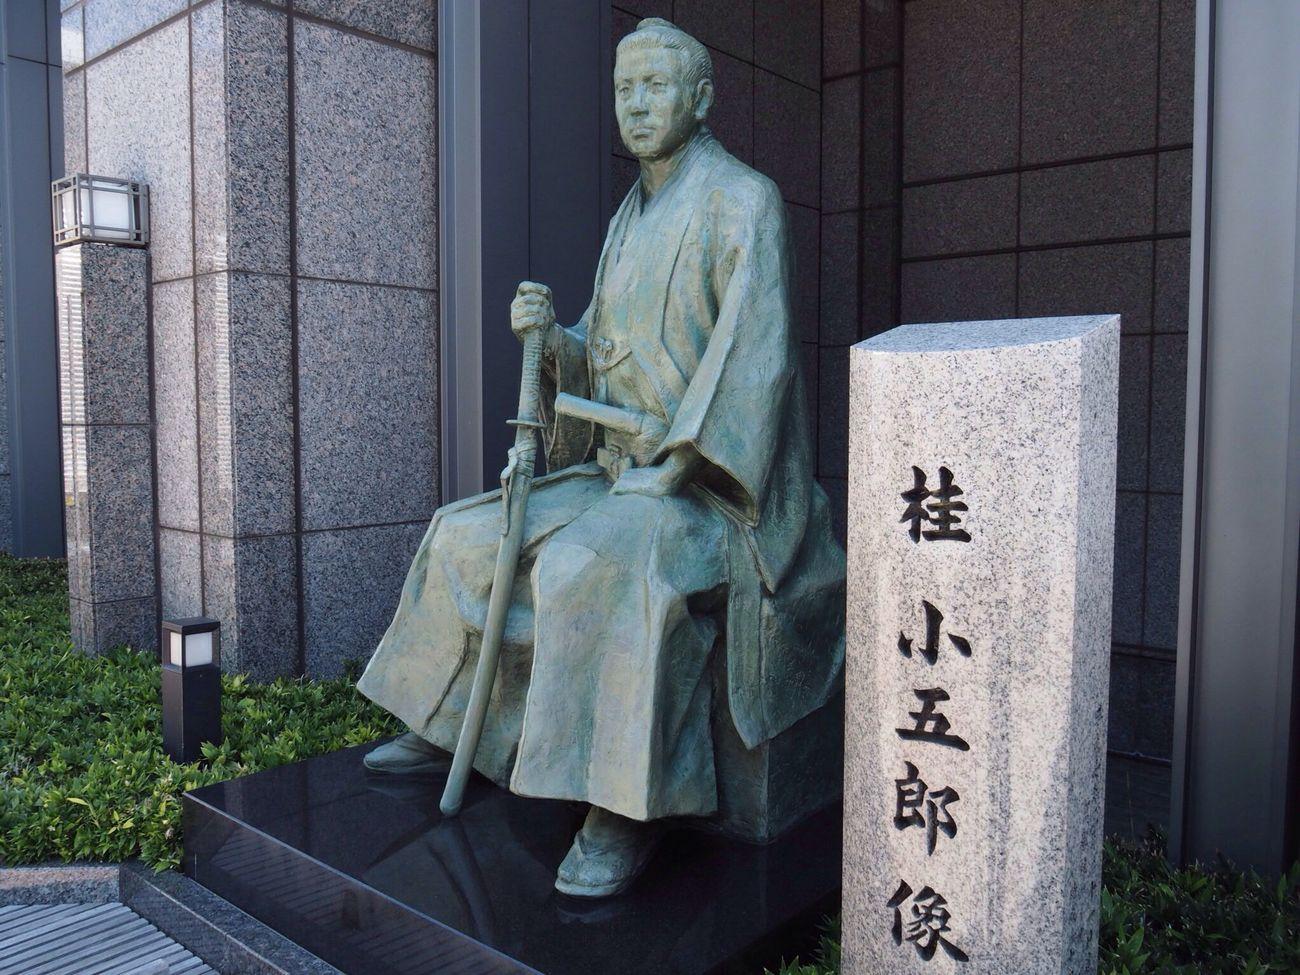 Kyoto Japan Statue Sculpture Kogorokatsura Takayoshikido History Meiji End Of The Edo Era Person Olympus PEN-F 京都 日本 桂小五郎 木戸孝允 長州 幕末 明治 維新